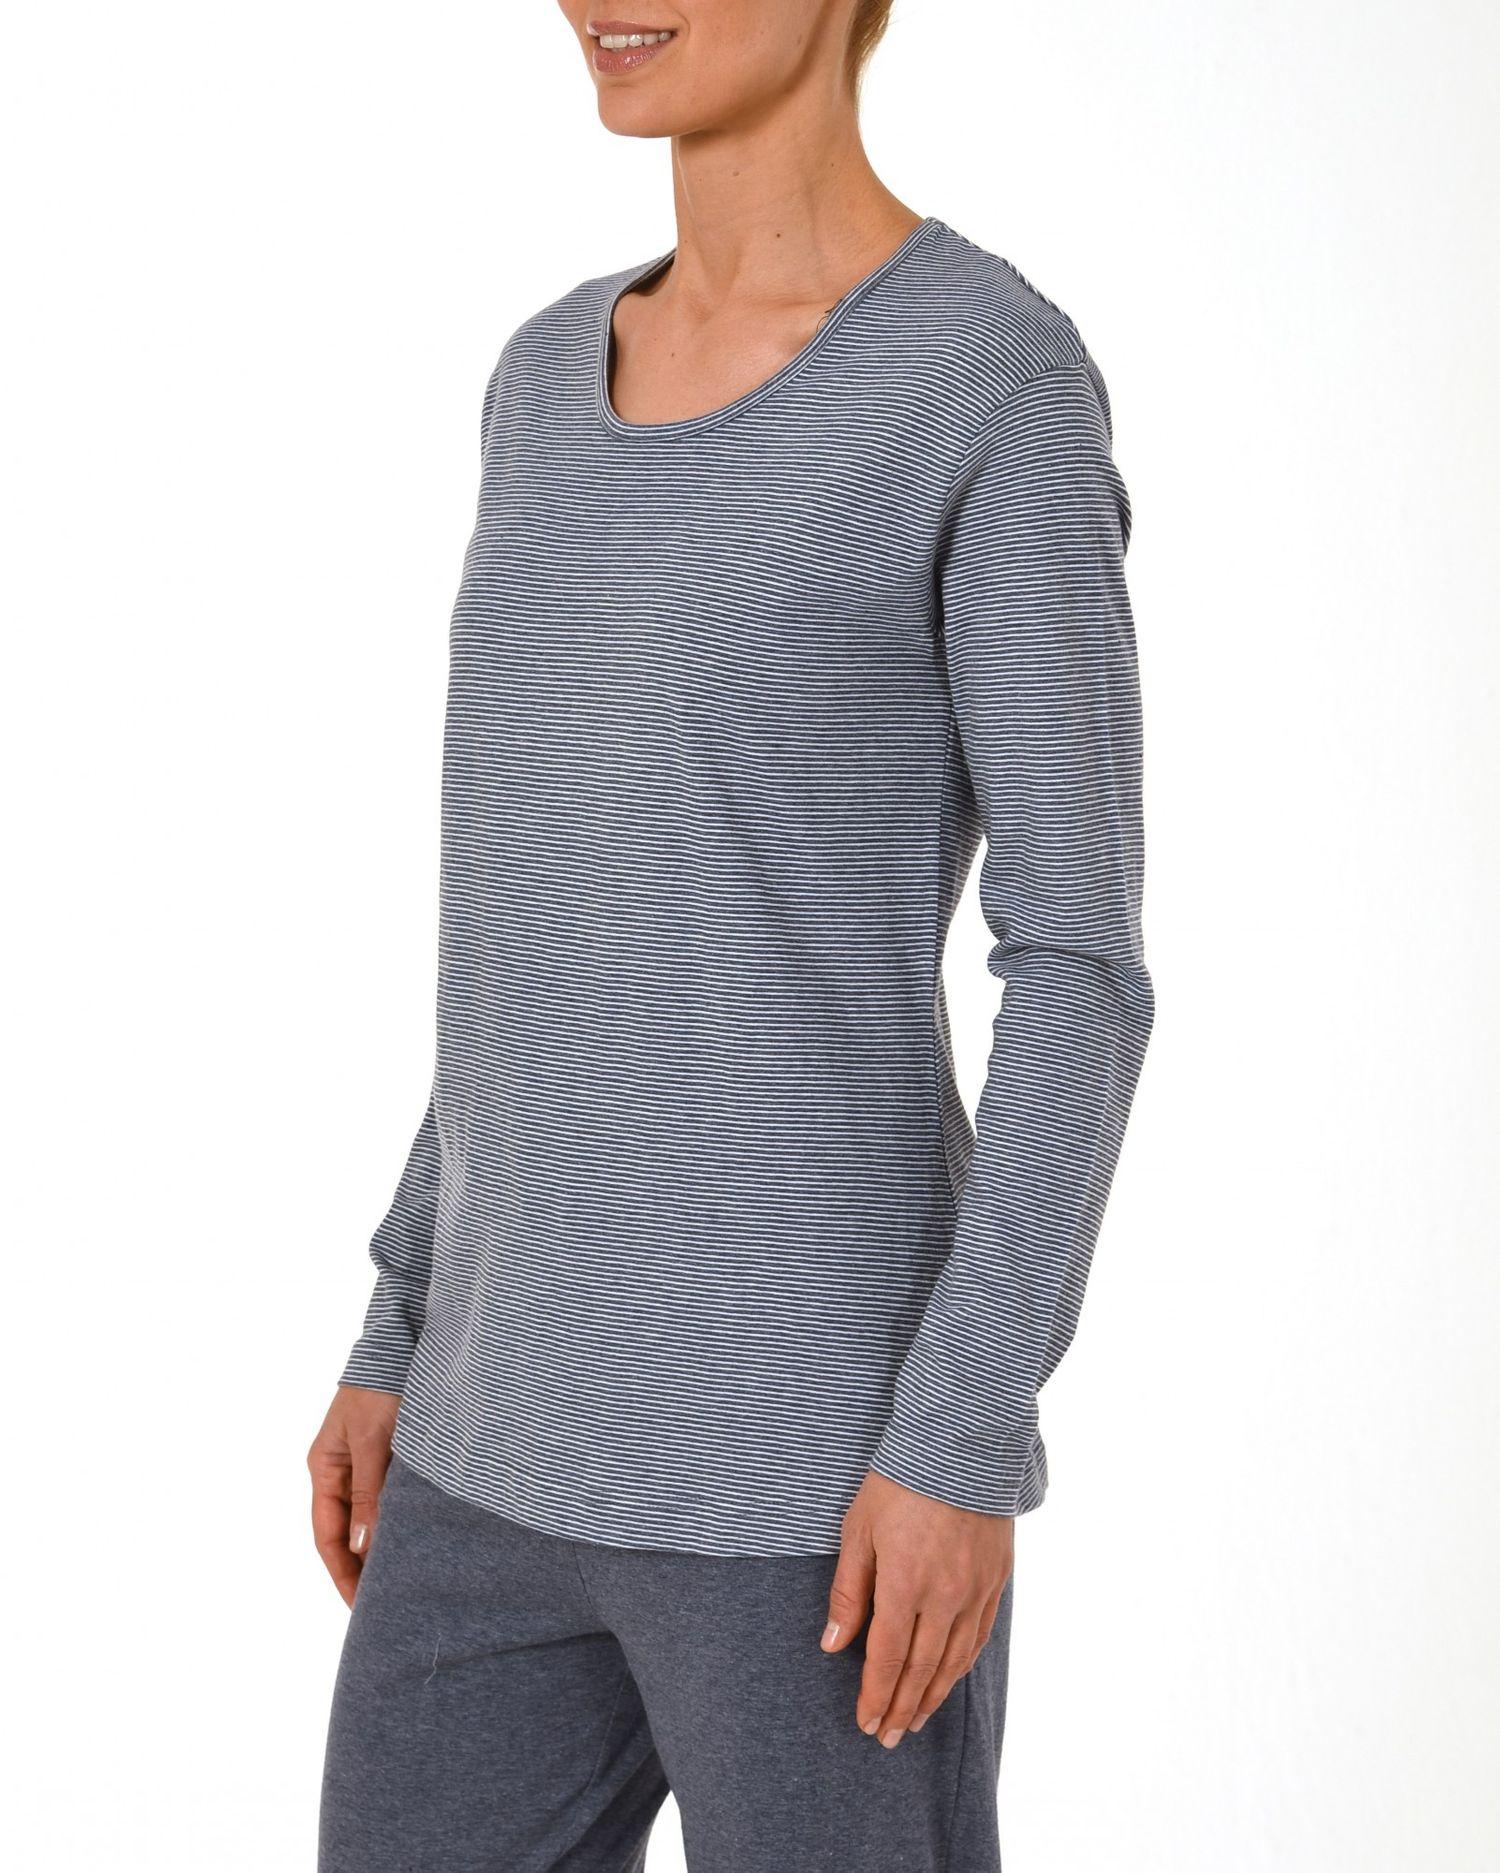 Damen Shirt  Oberteil - langarm Mix & Match Streifendesign – 171 219 90 903 – Bild 2